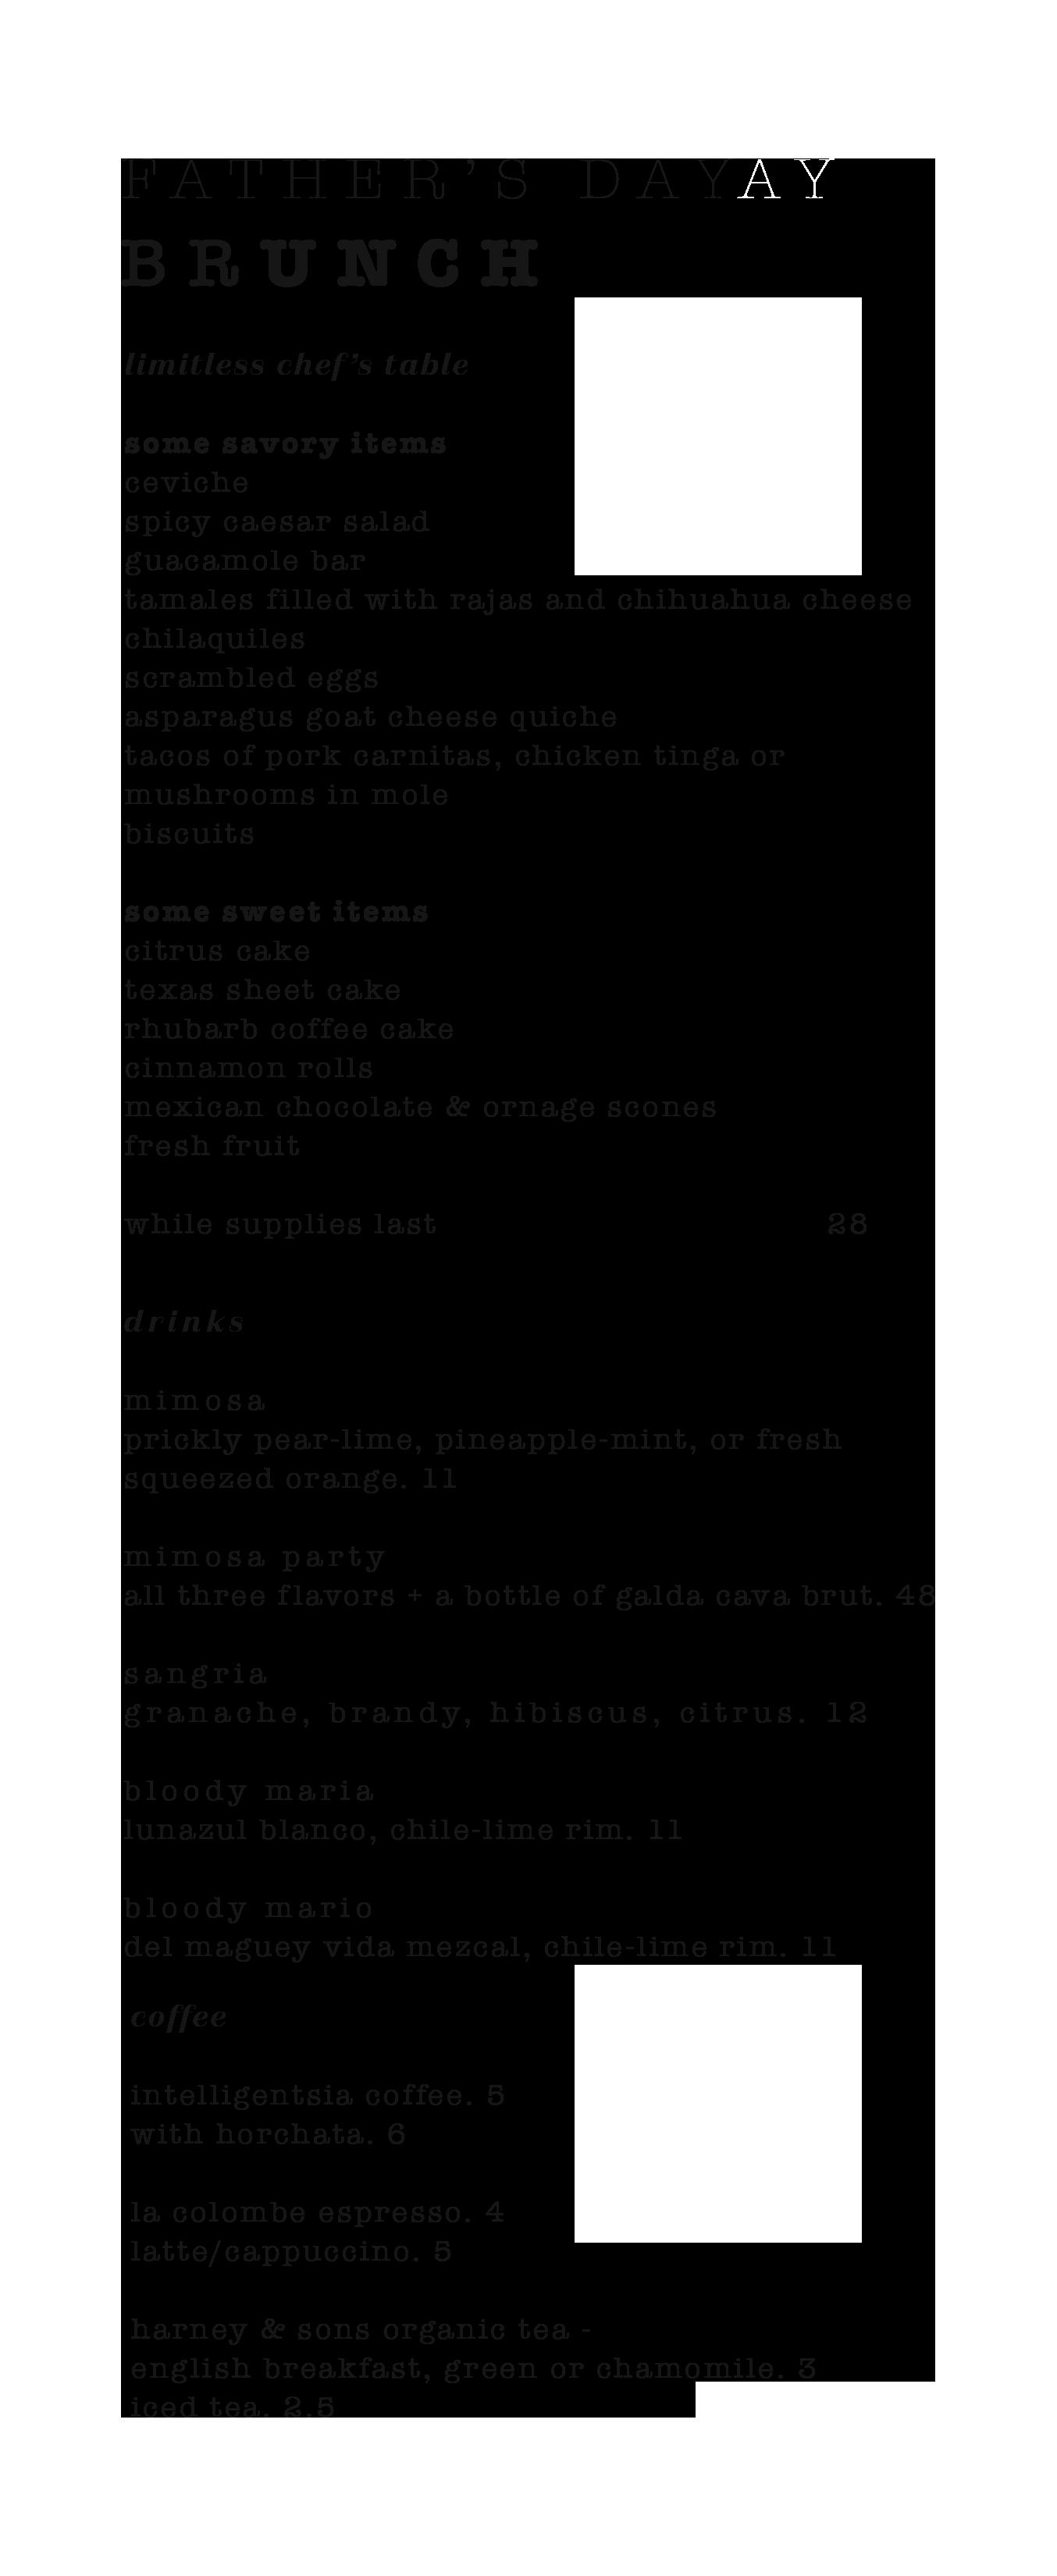 fd_brunch_menu.png